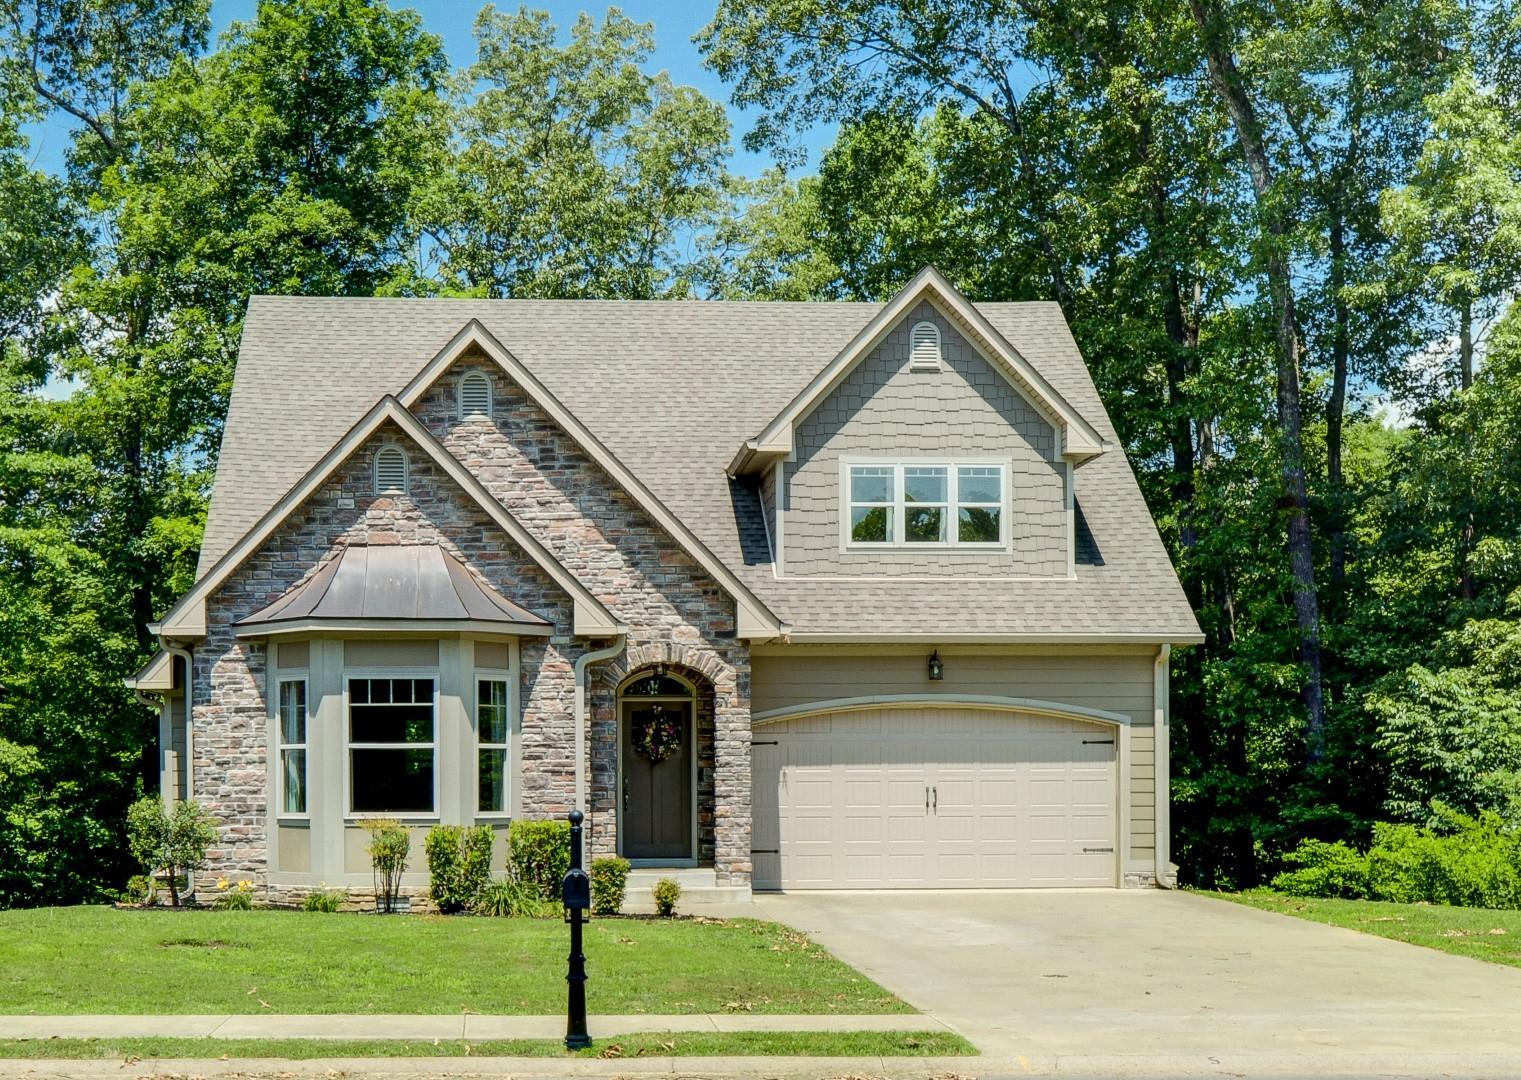 232 Birnam Wood Trc, Clarksville, TN 37043 - Clarksville, TN real estate listing